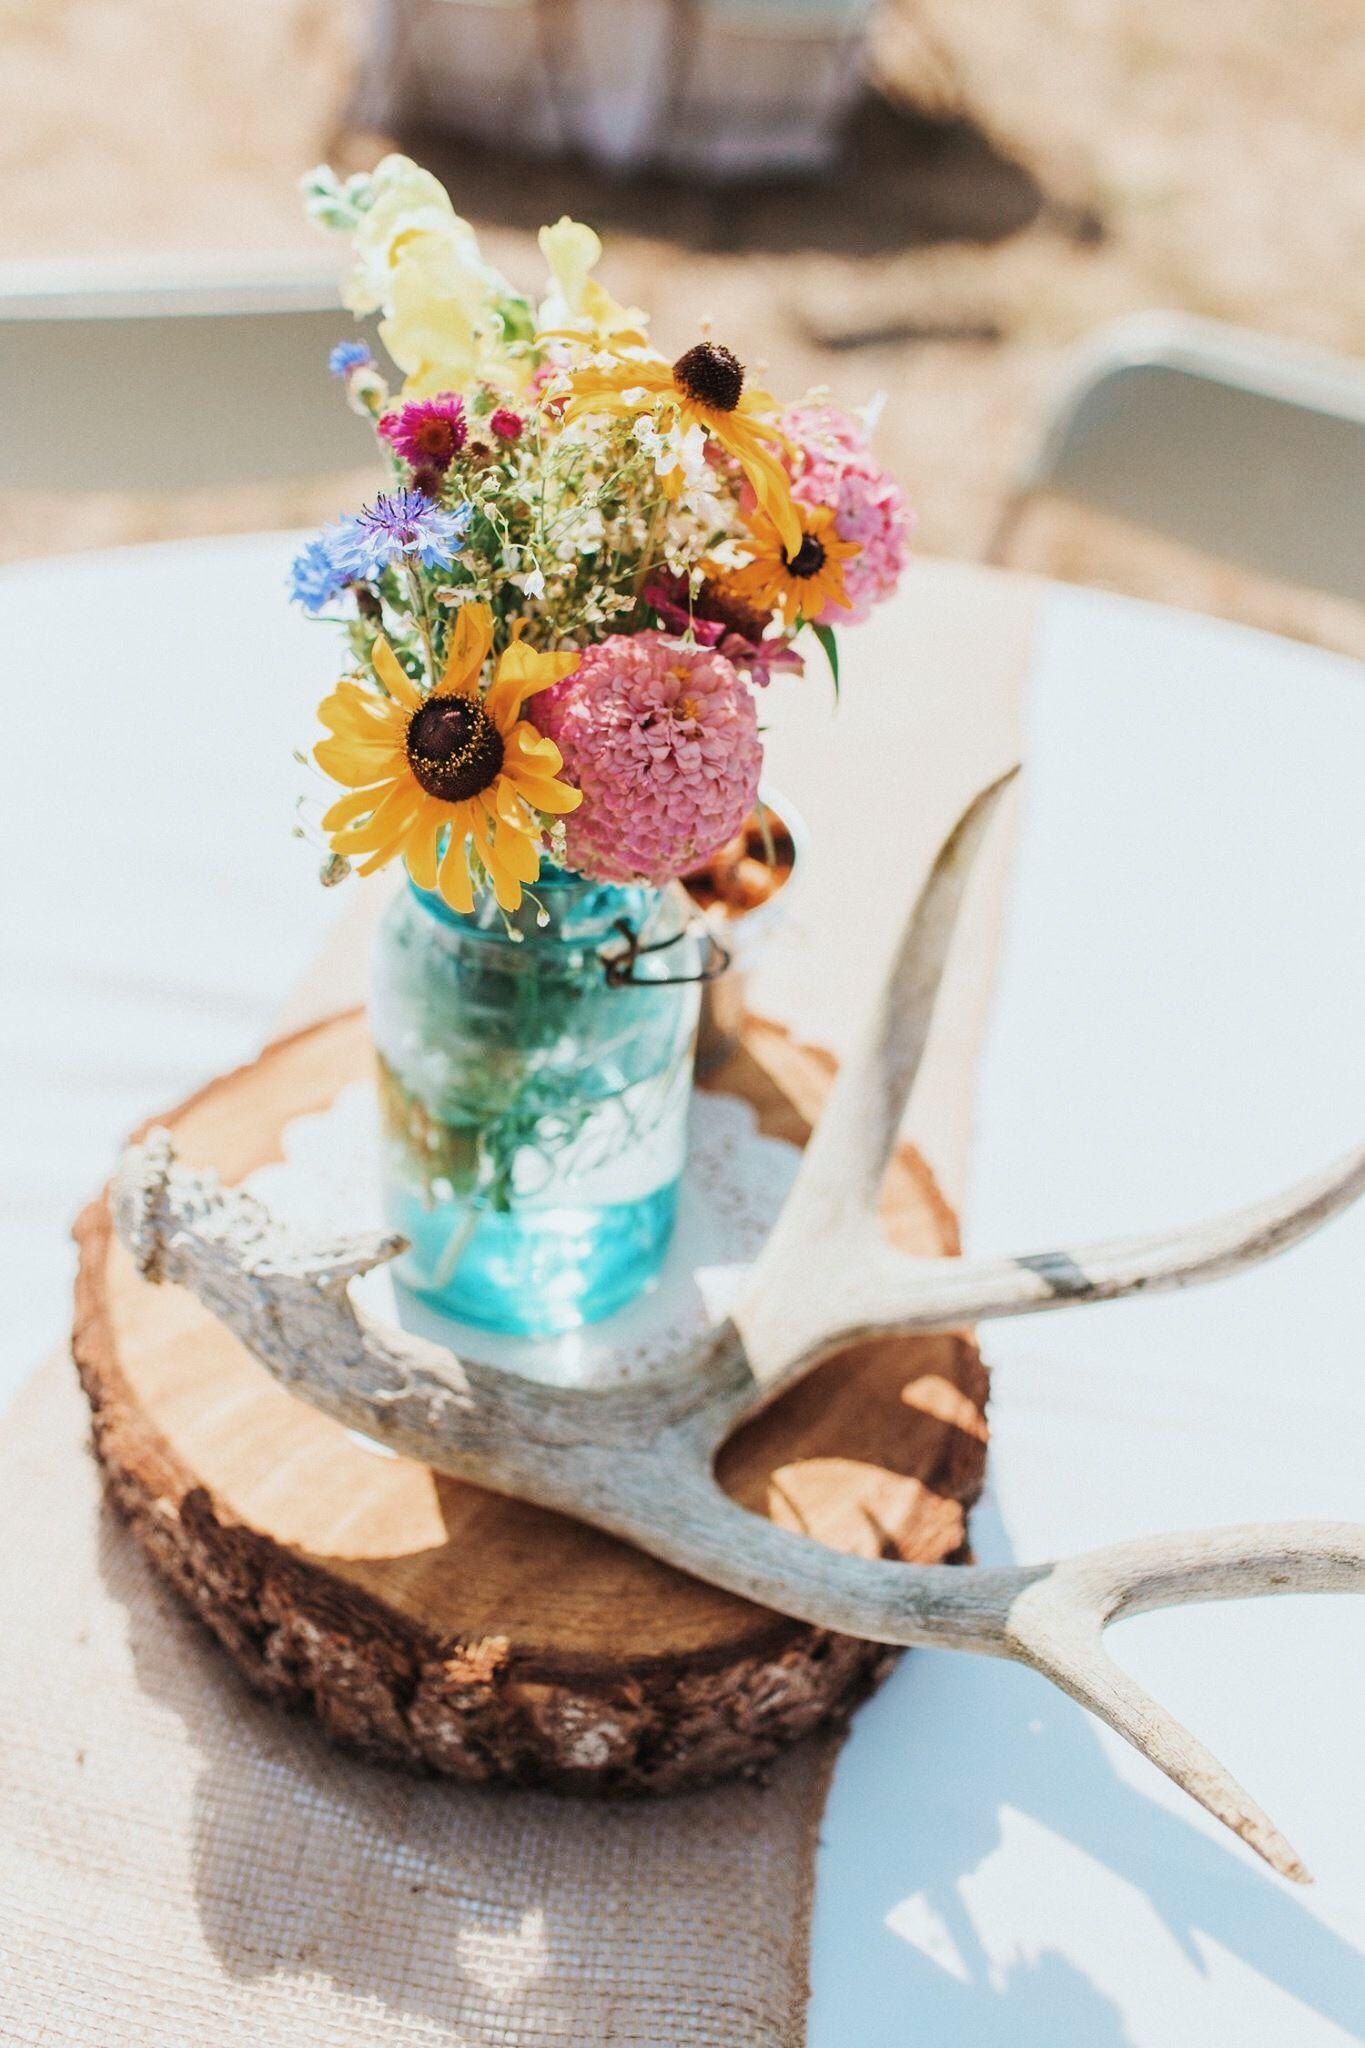 Wedding | Wedding centerpieces mason jars, Antler wedding centerpieces,  Wildflower centerpieces